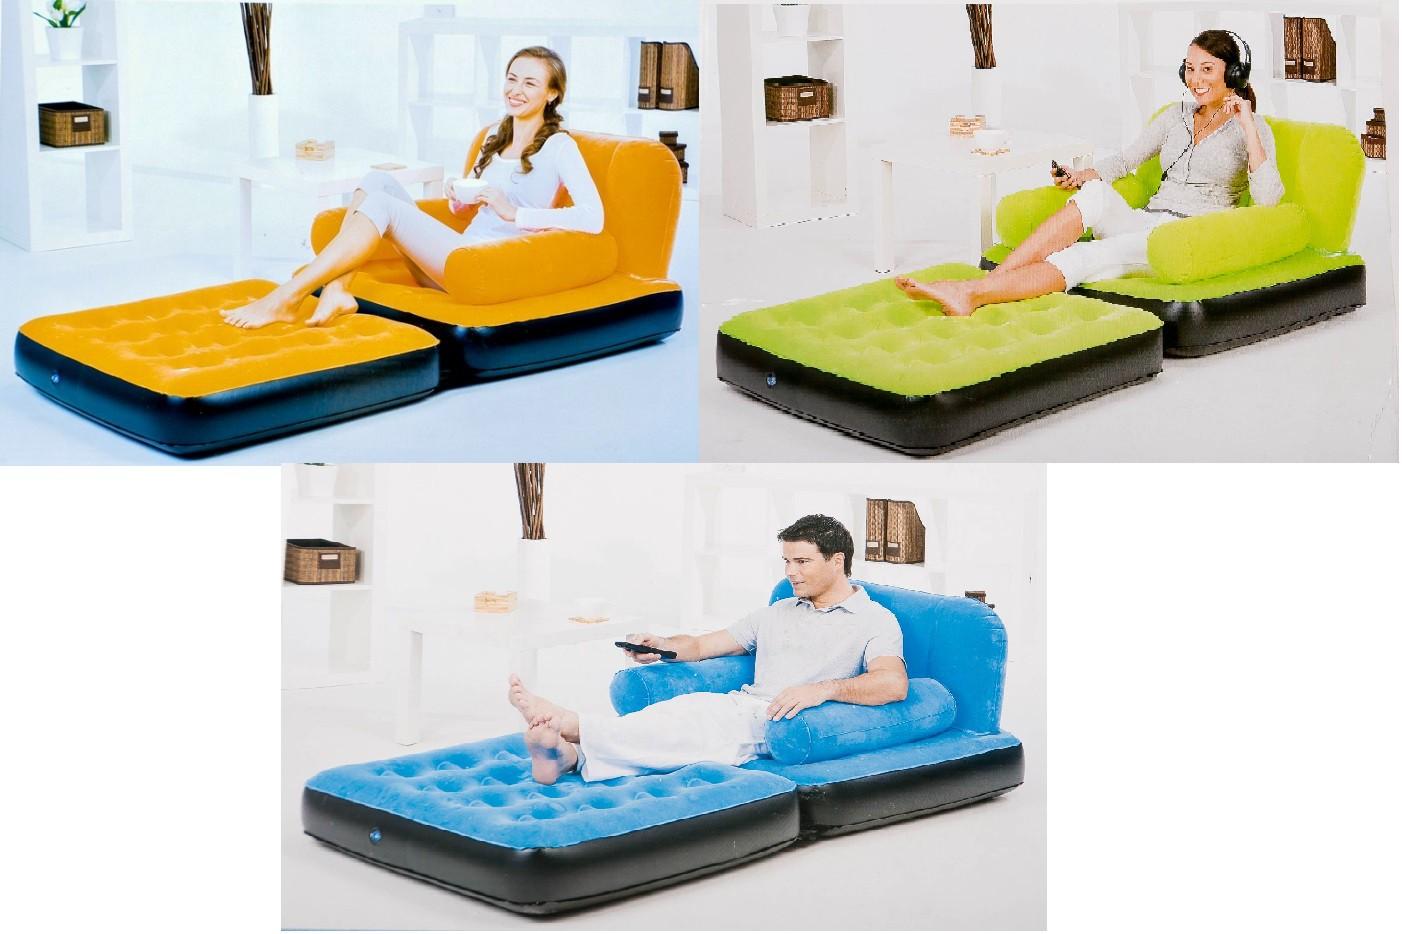 g stebett sessel diverse farben campingbett sofa aufblasbares bett luftsessel ebay. Black Bedroom Furniture Sets. Home Design Ideas